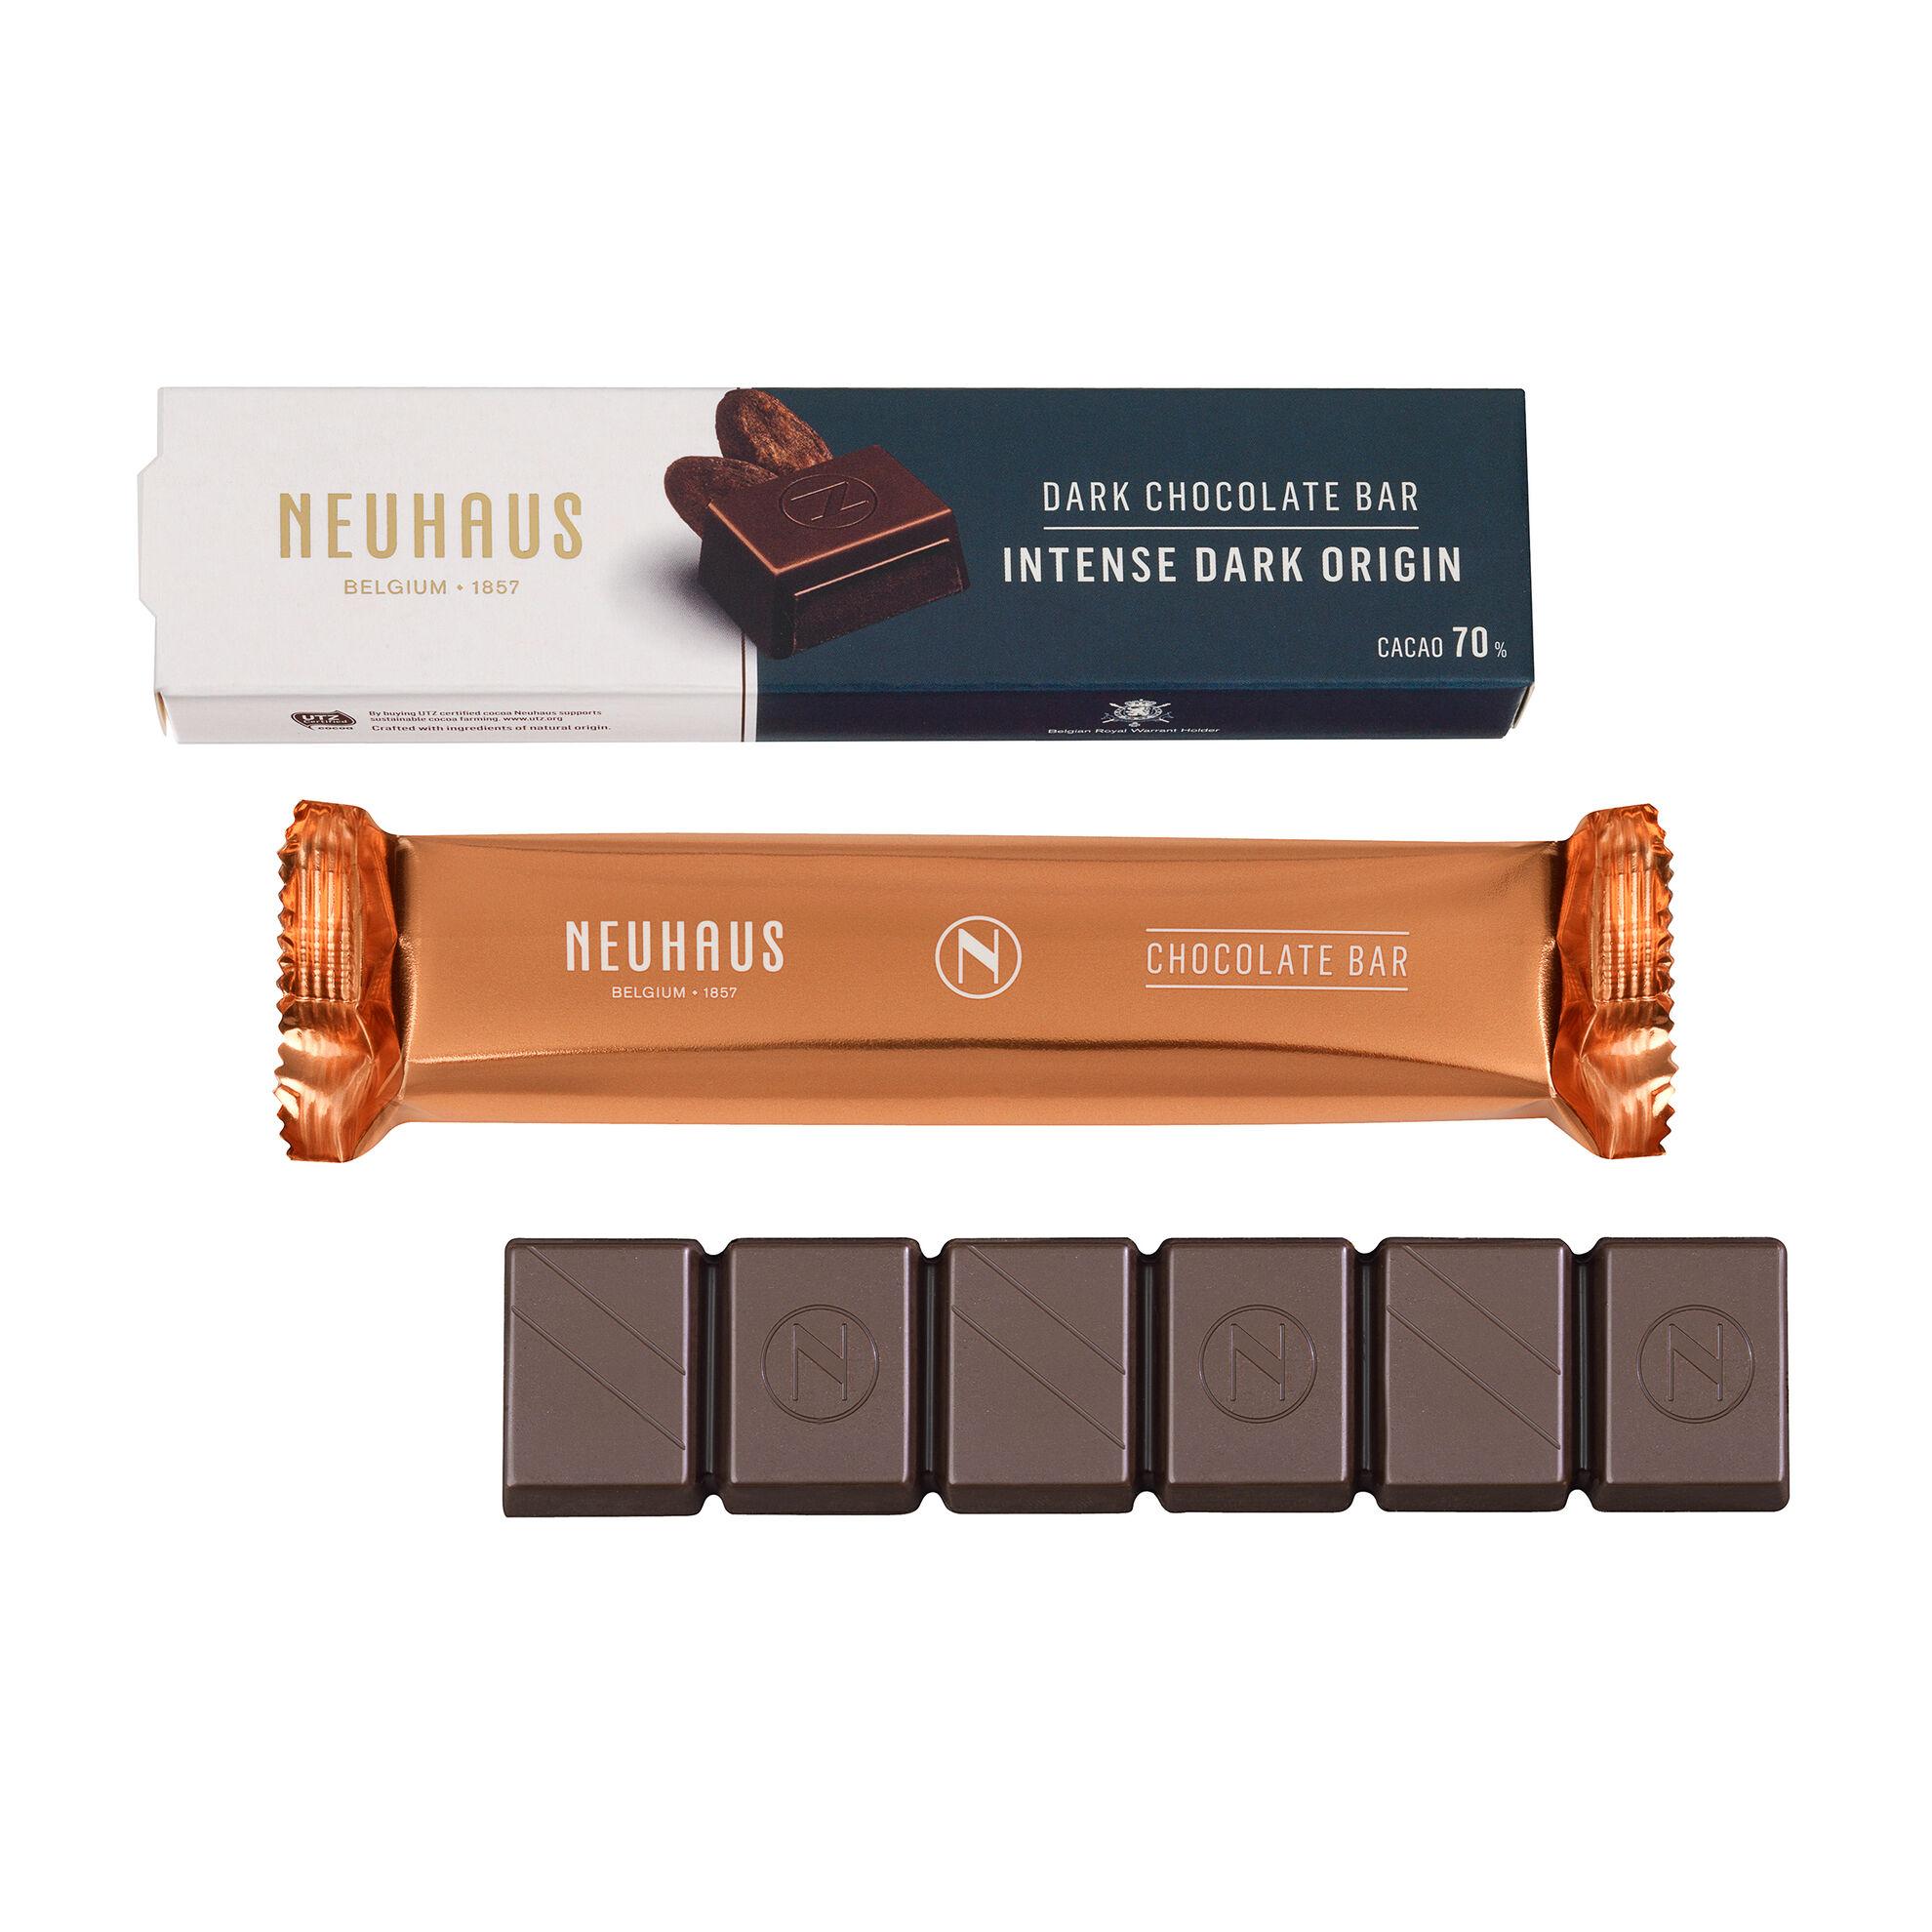 Dark Chocolate Bar - Intense Dark Origin image number 01